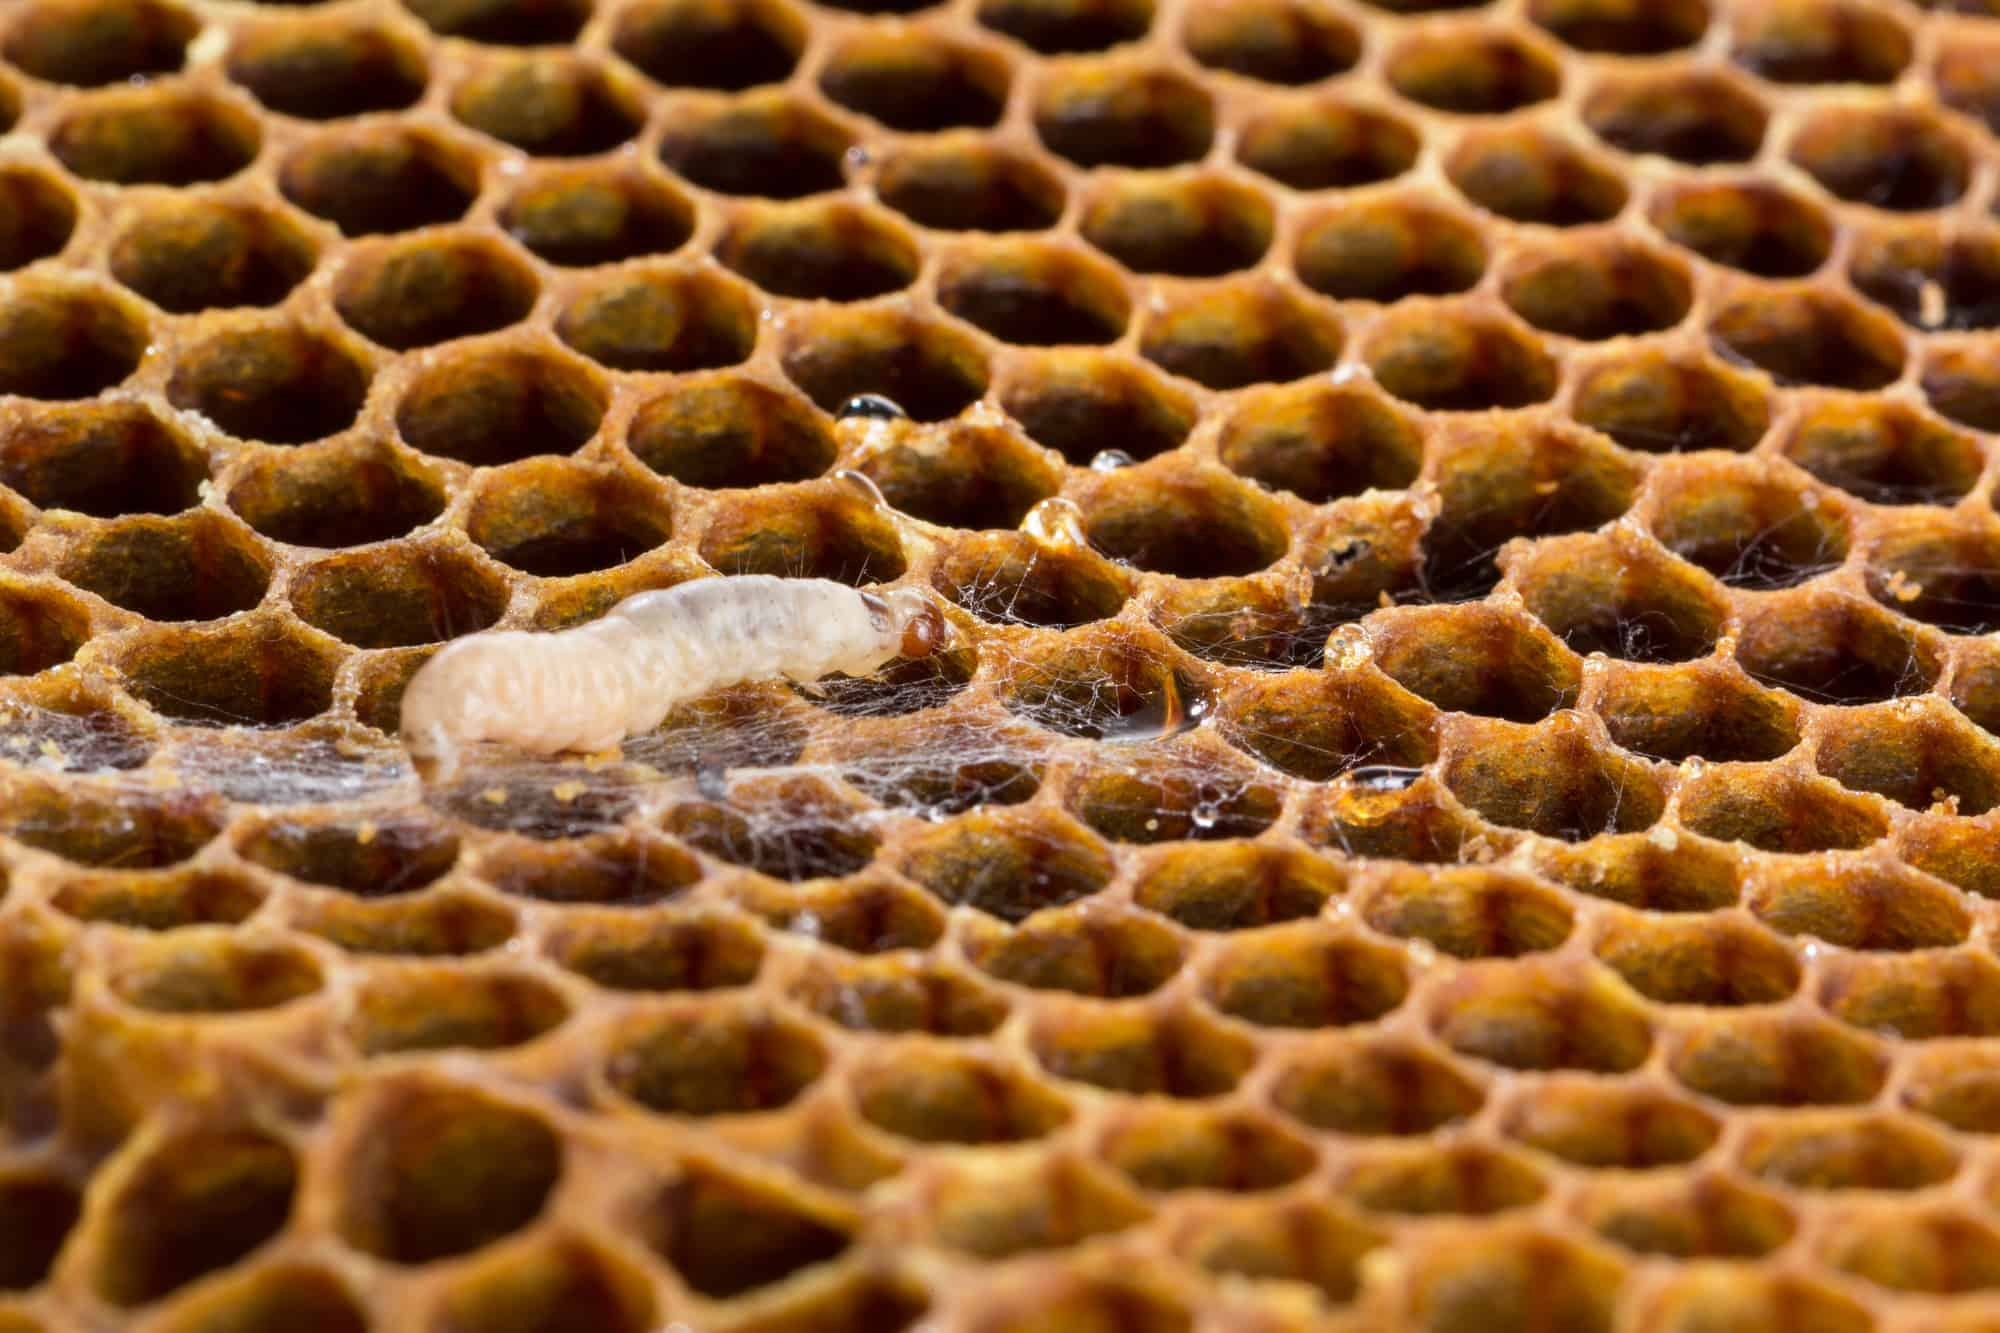 Wax Moth in Beehive